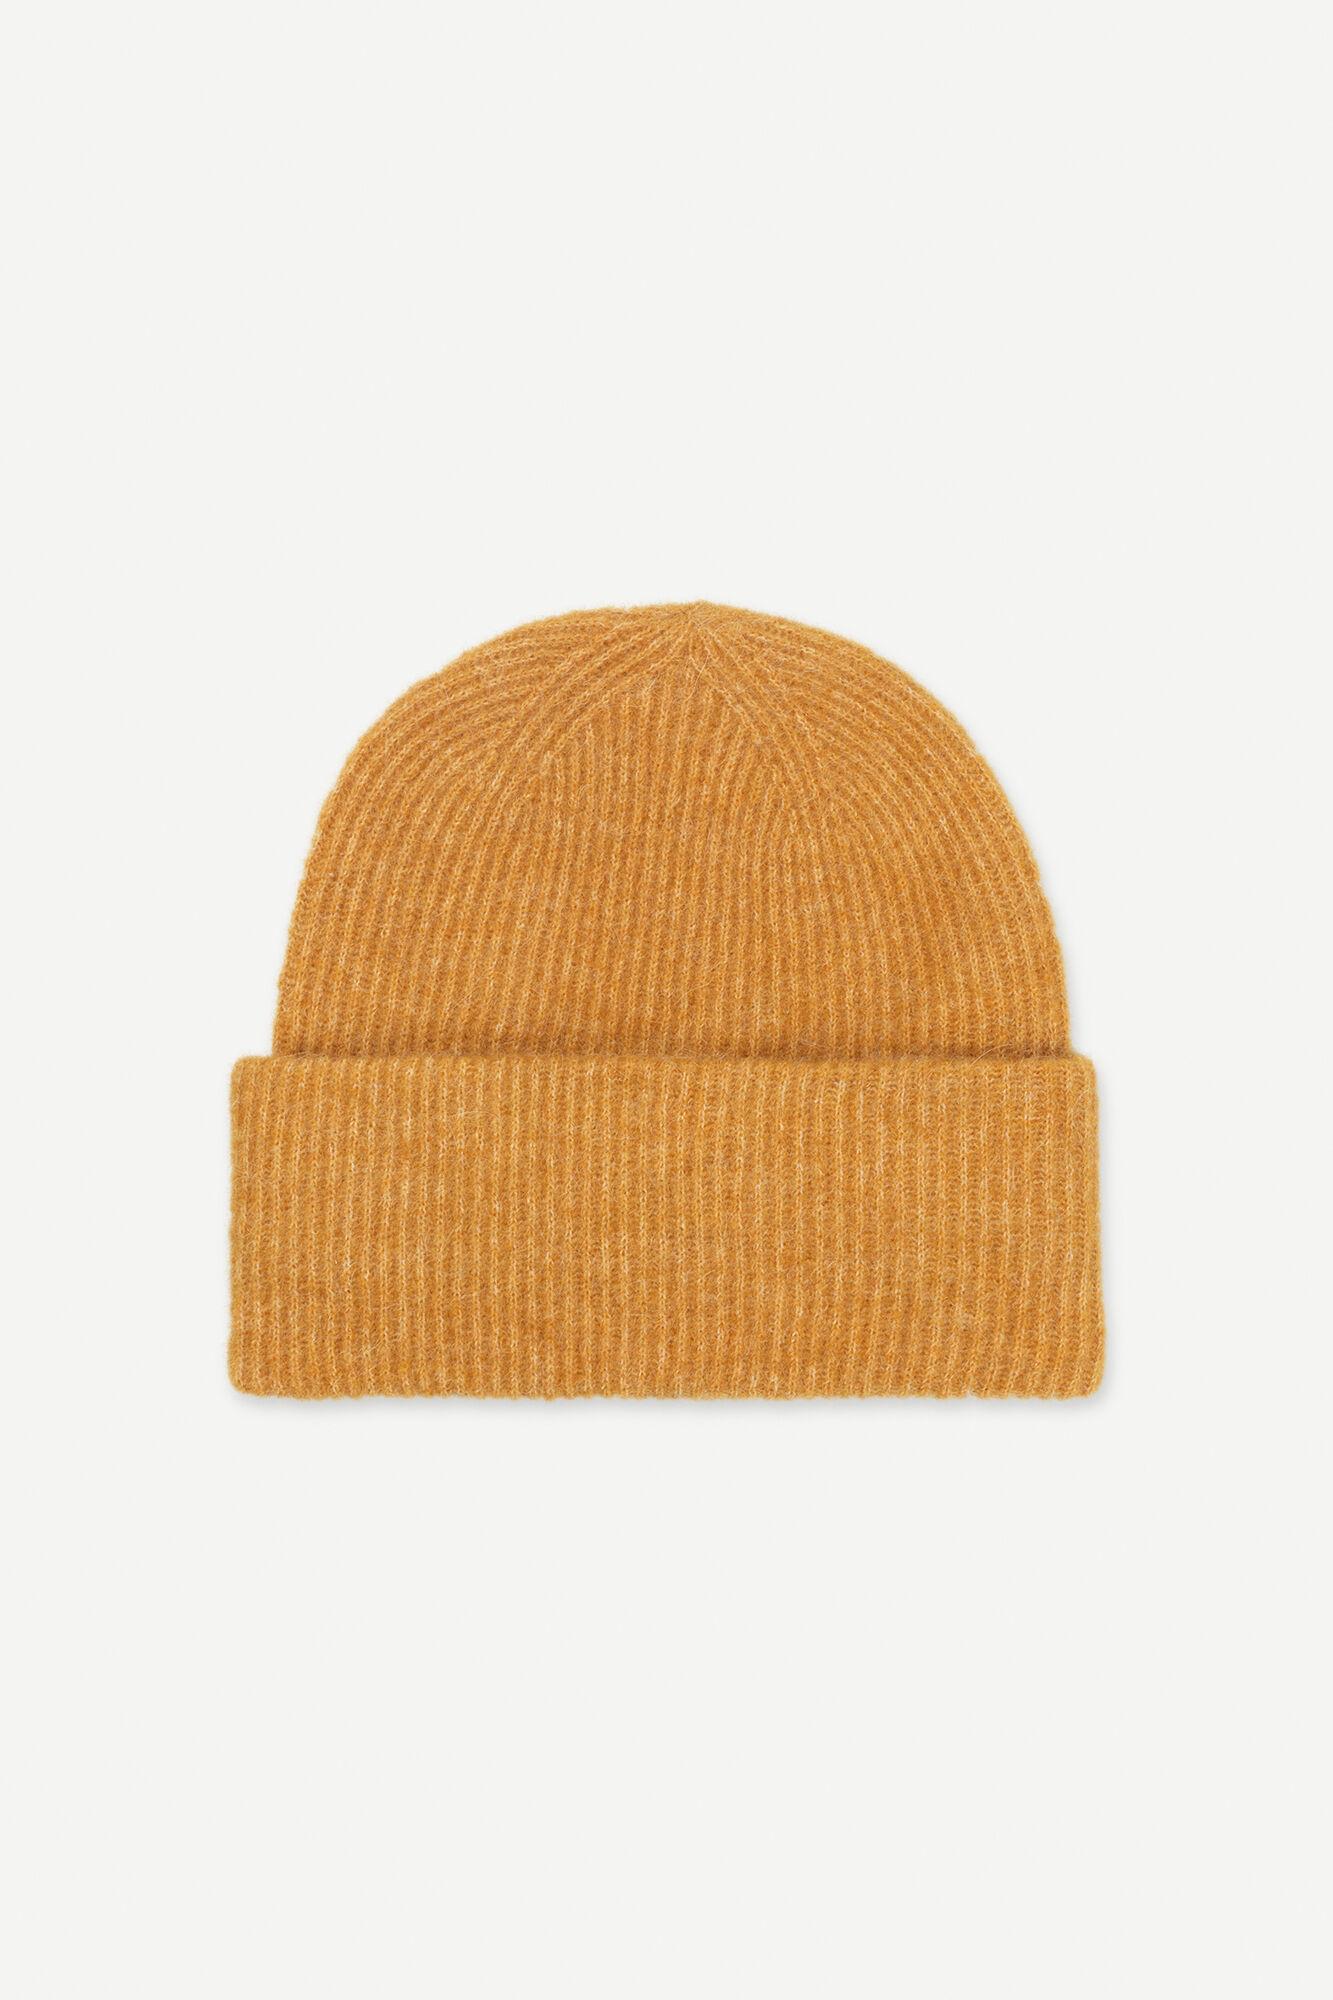 Nor hat 7355